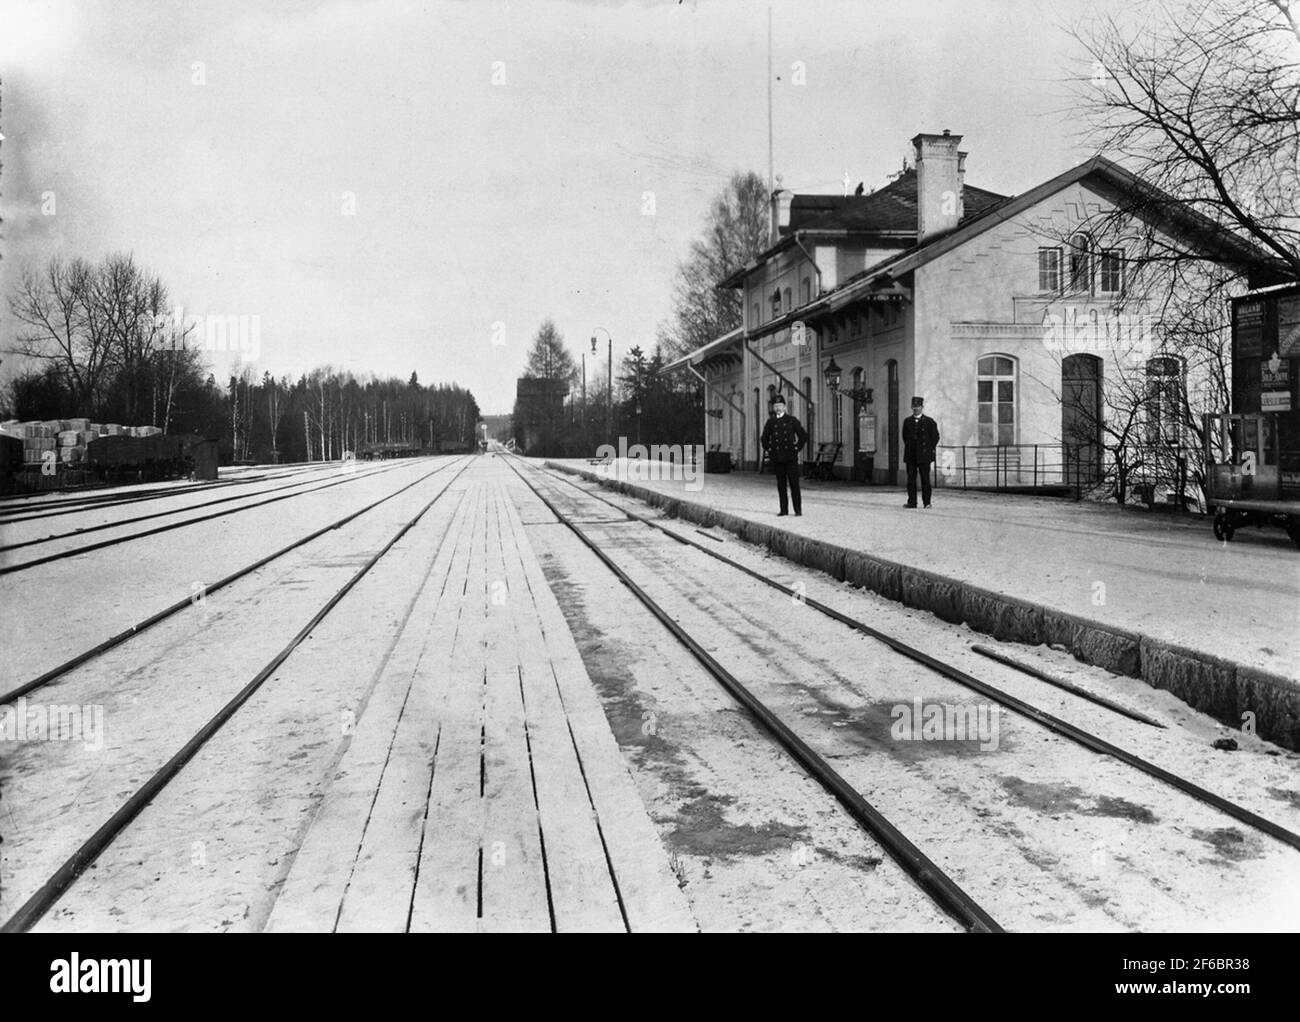 Gare d'Åmot, puis ÅMotors. Banque D'Images